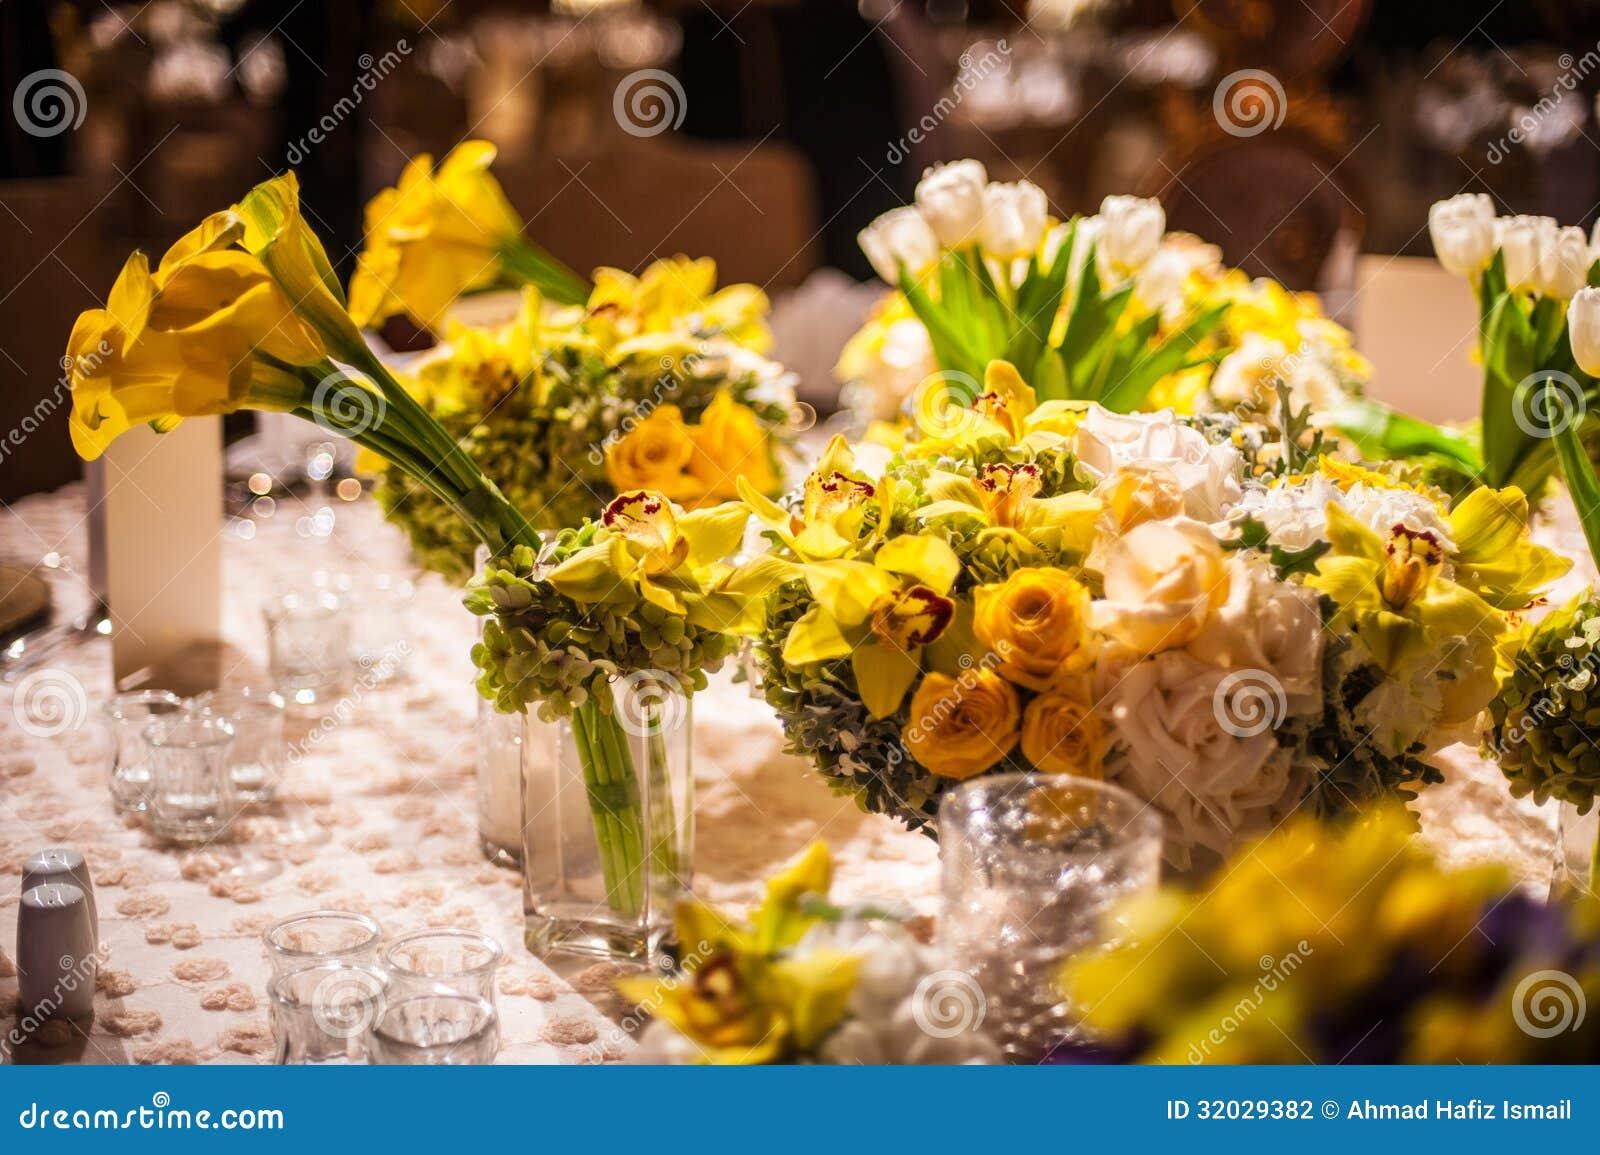 Flower Arrangement On A Elegant Dinner Table Stock ... Dining Chair Clipart